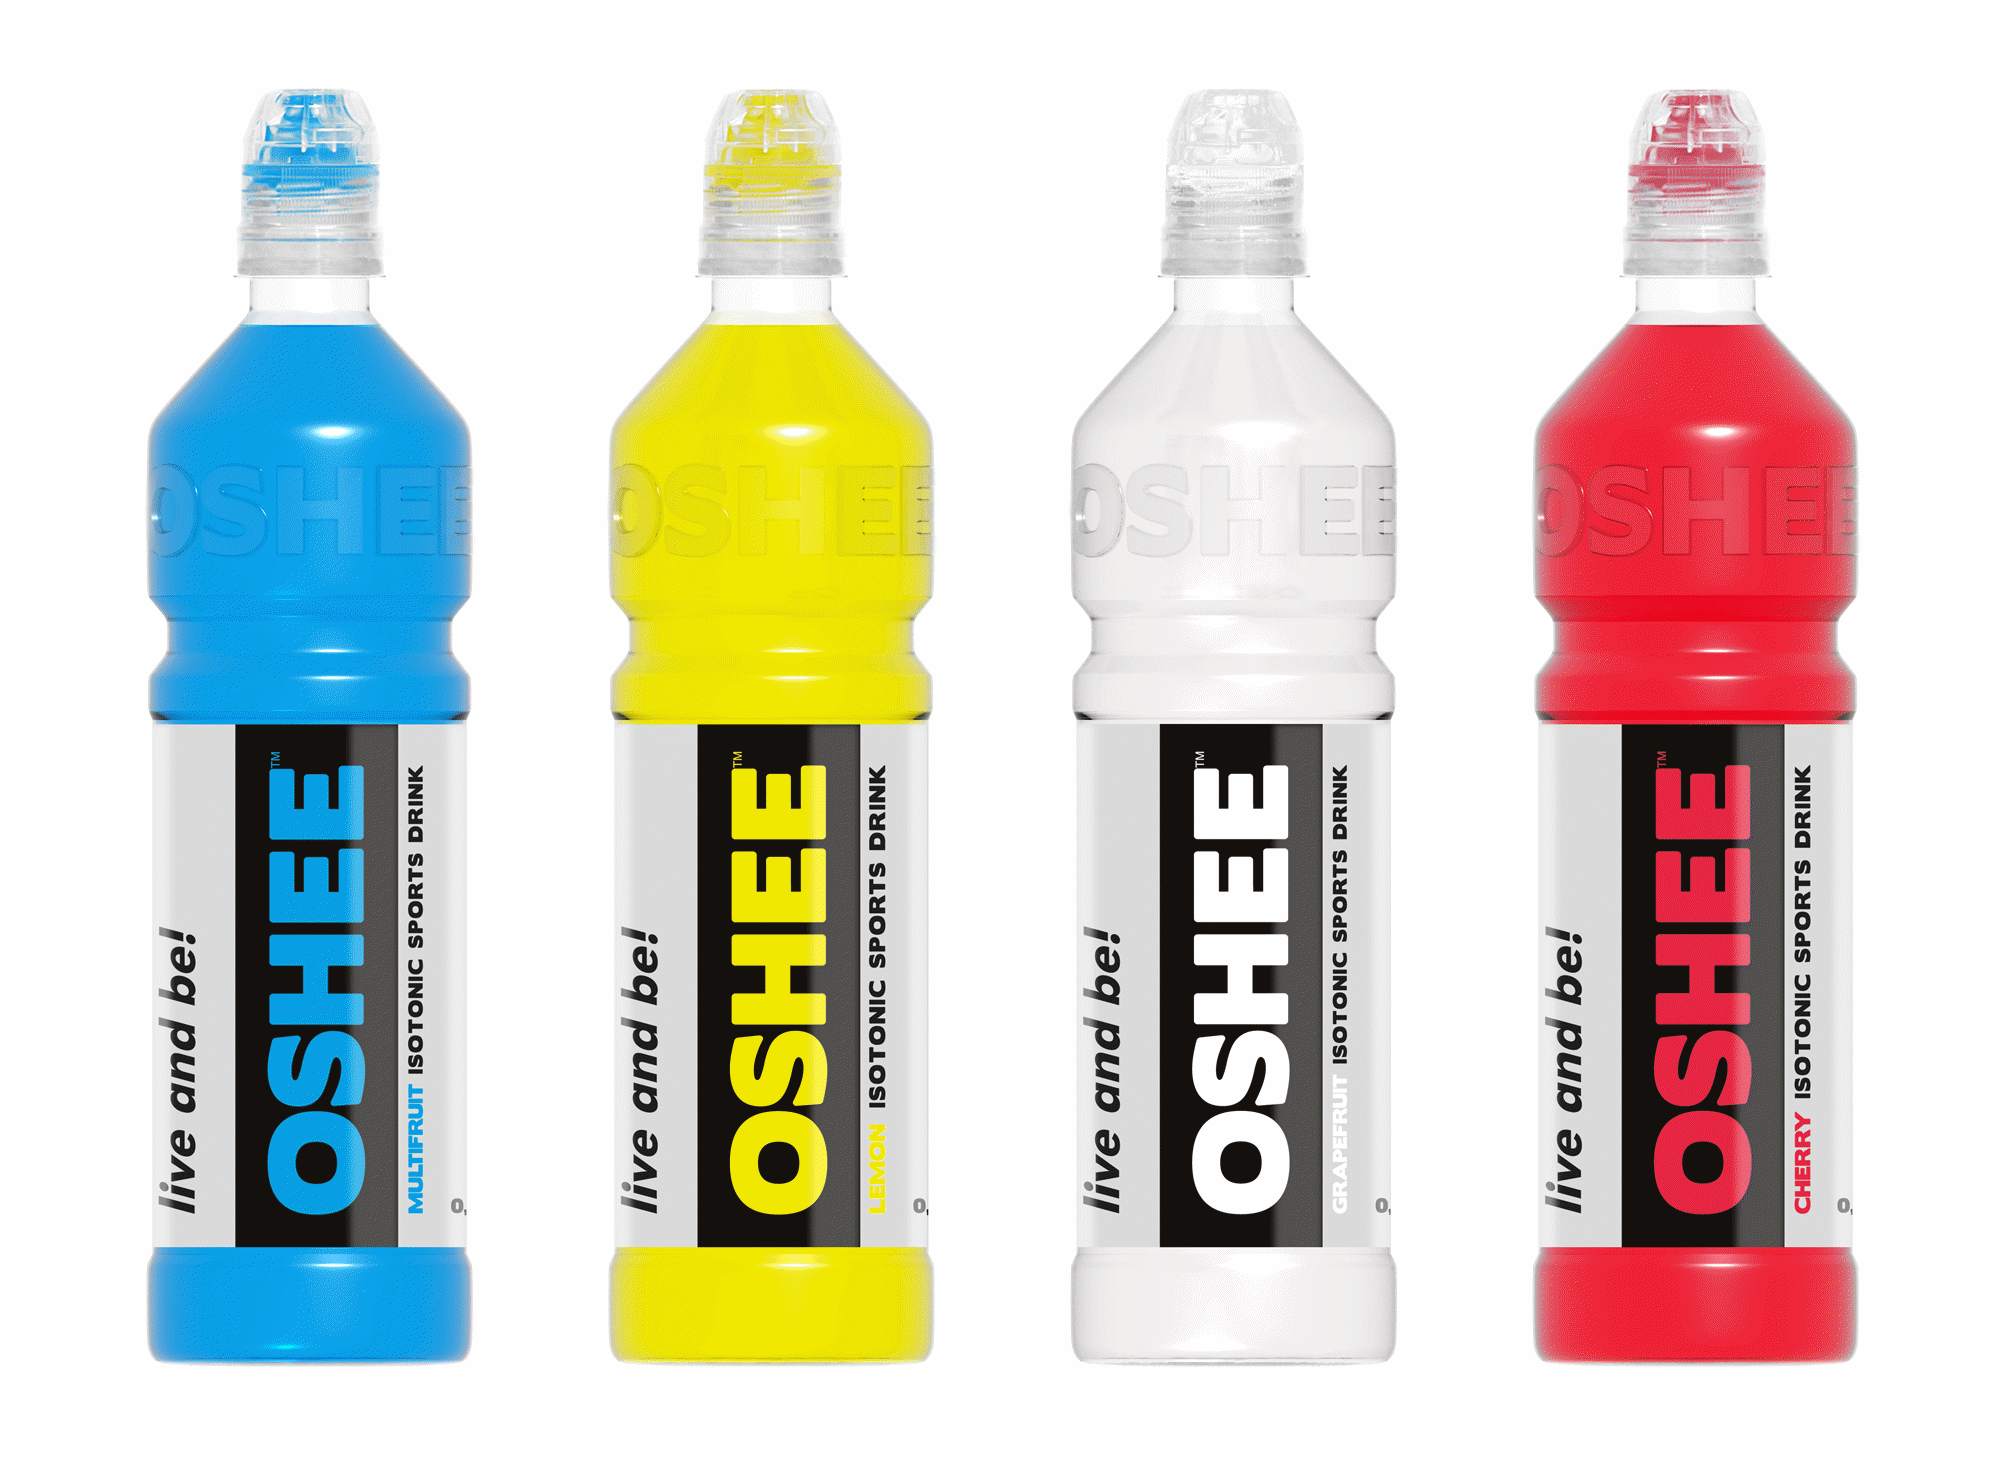 Oshee Sports Drink Product Design Http Www Benhauer Pl Blog Tag Neumannbrown Sports Drink Drinks Drinks Design